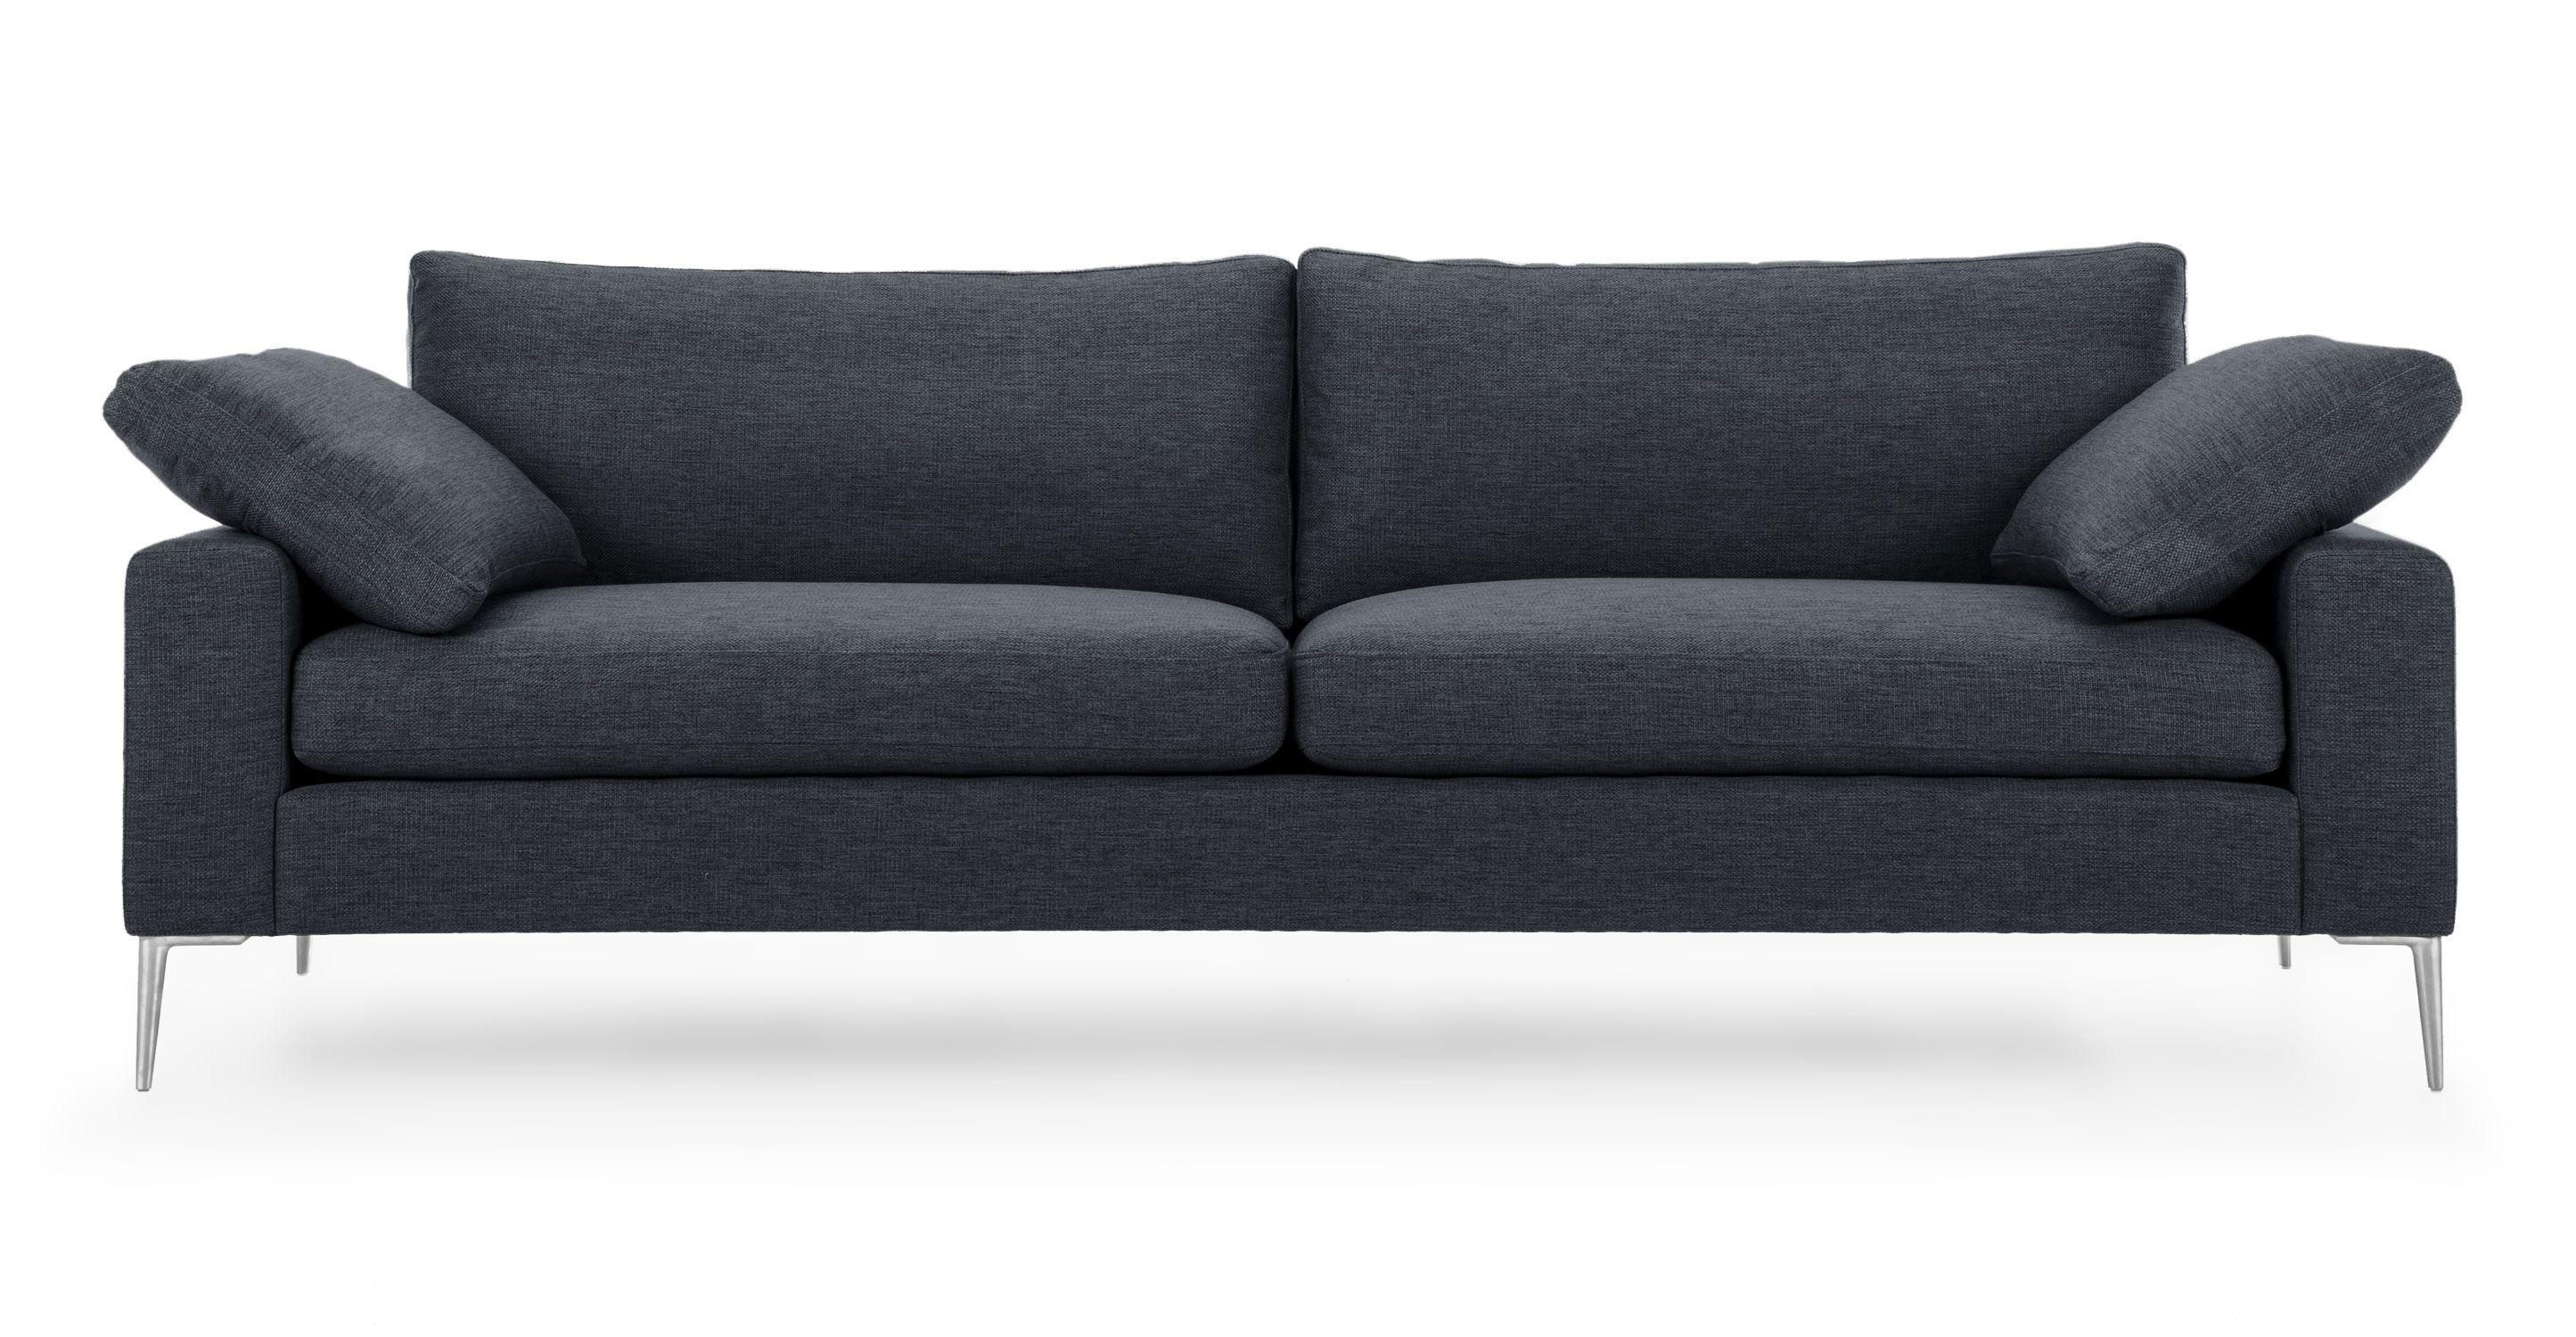 Nova Bard Gray Sofa Metal Legs Scandinavian furniture